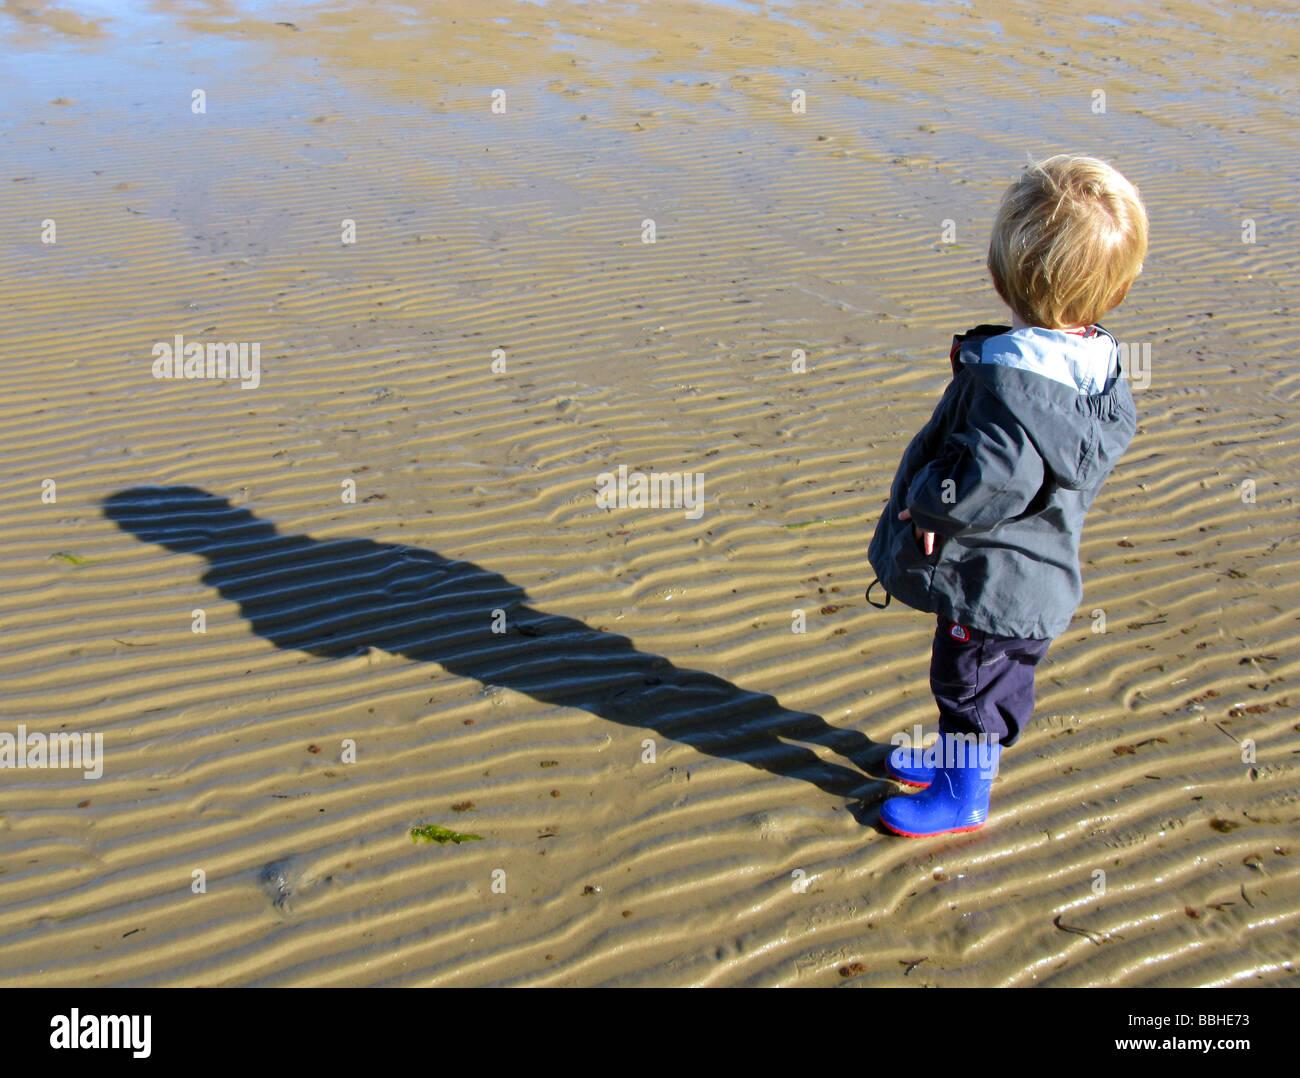 Boy alone on beach looking backwards - Stock Image